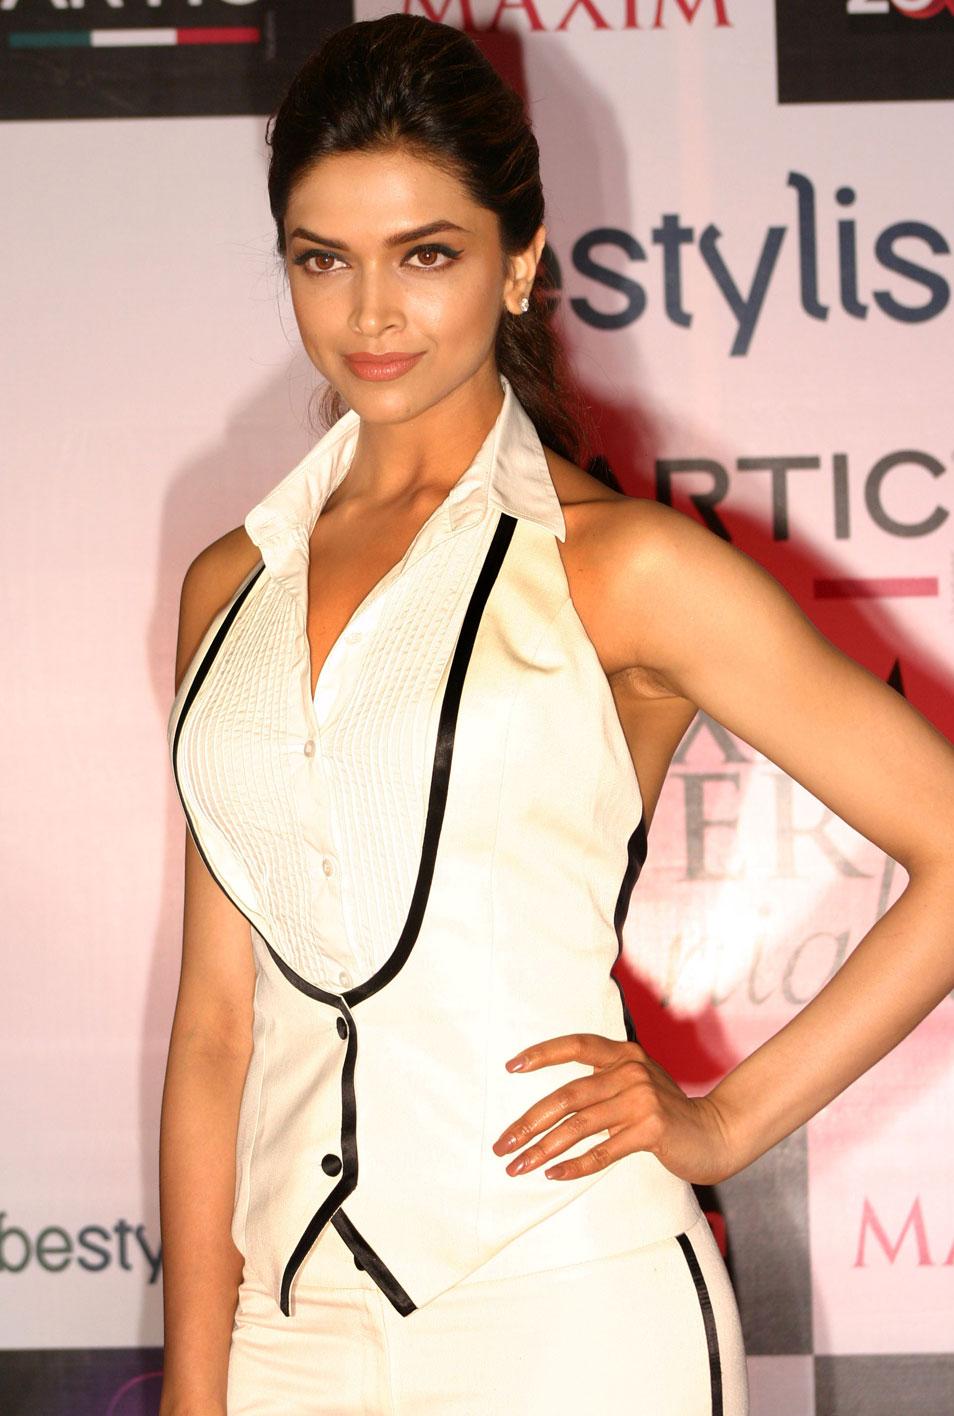 Deepika Padukone Sizzling Hot Photo